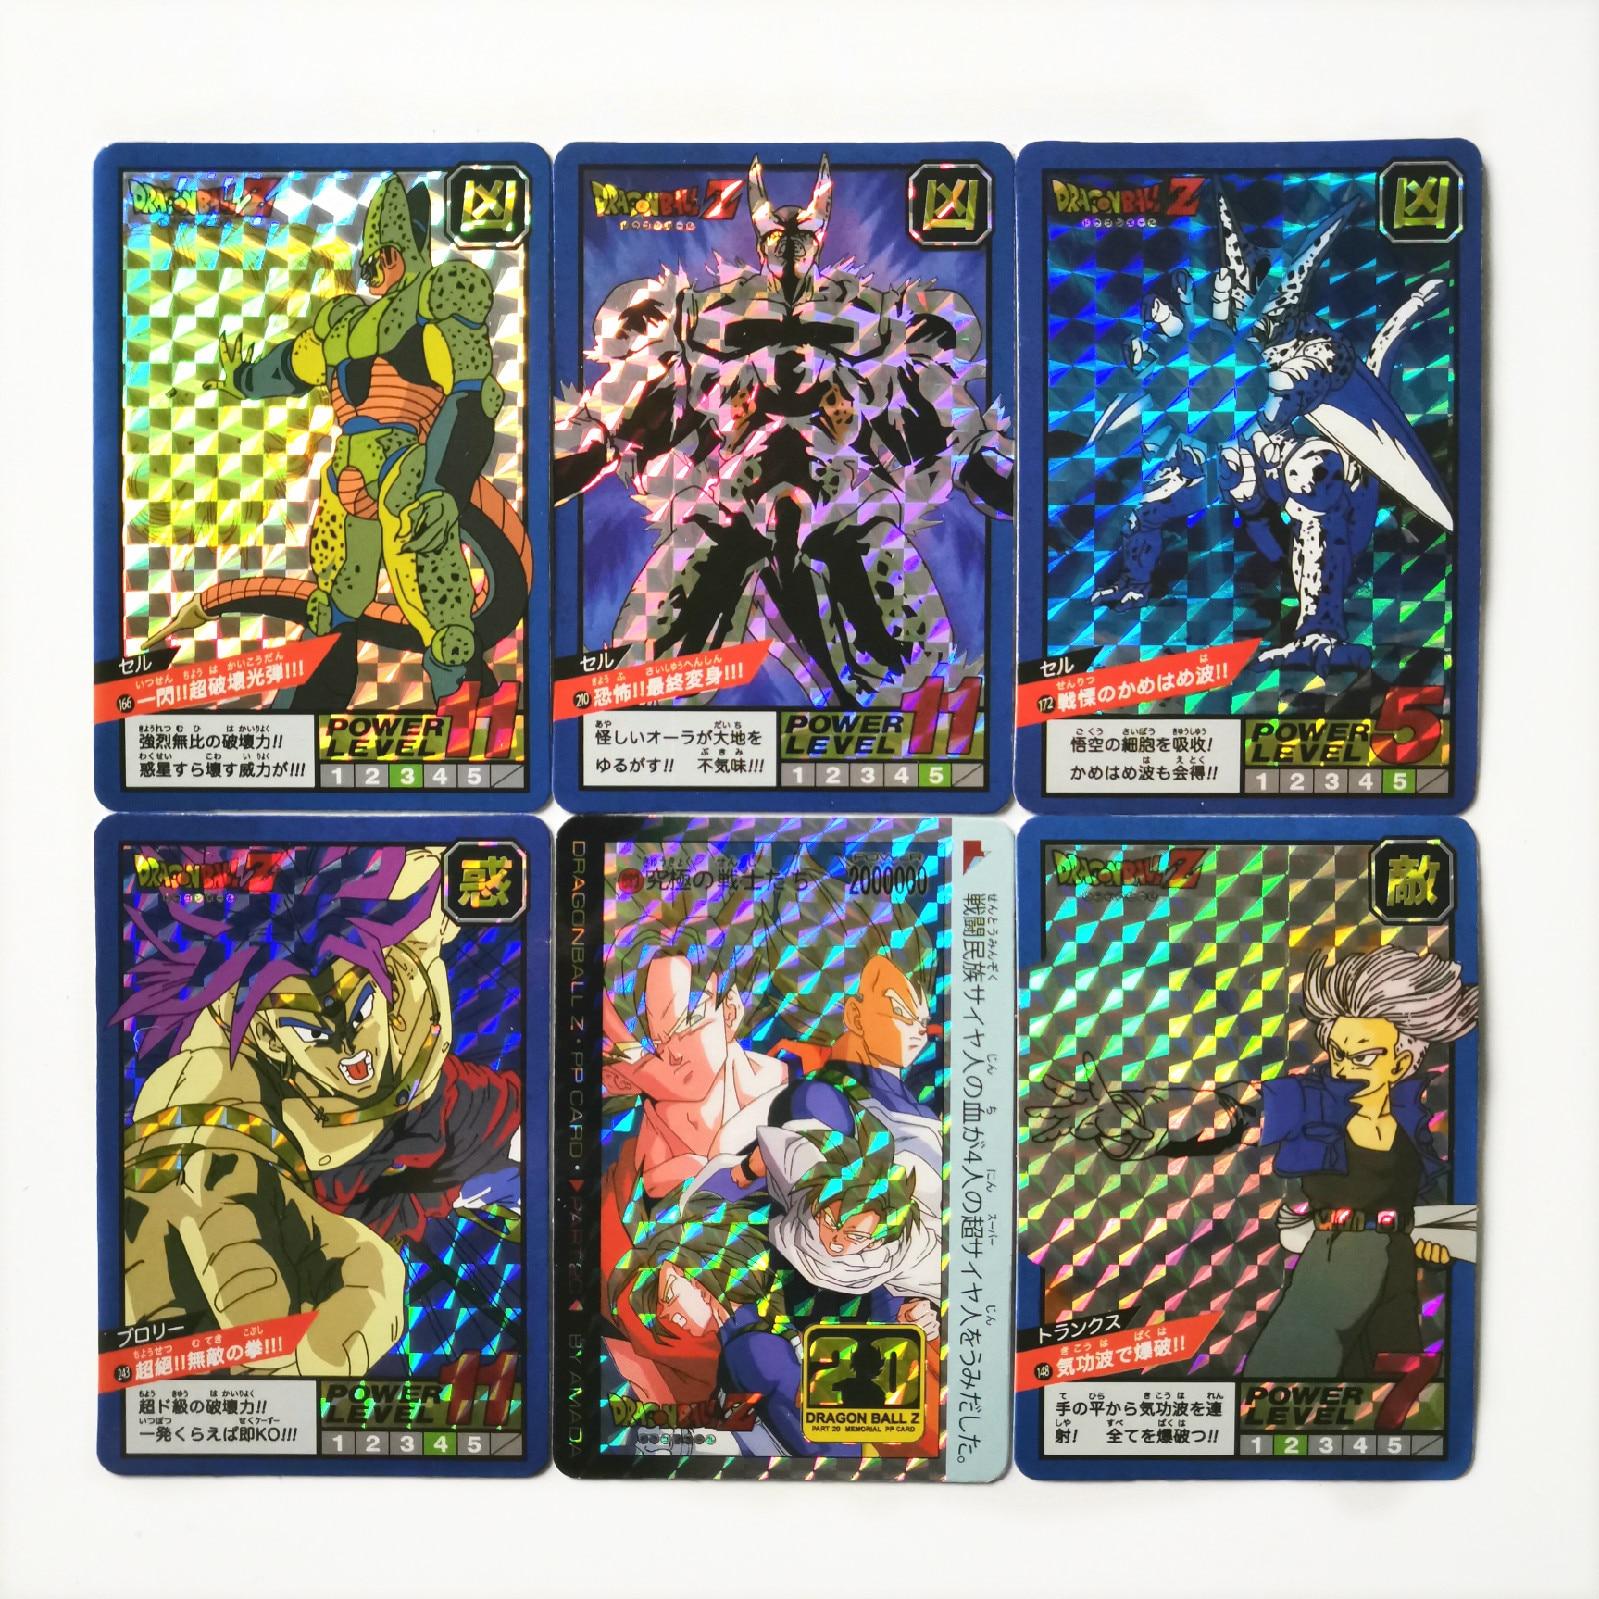 22pcs/set Super Dragon Ball Z Fighting PP20 Heroes Battle Card Ultra Instinct Goku Vegeta Game Collection Cards